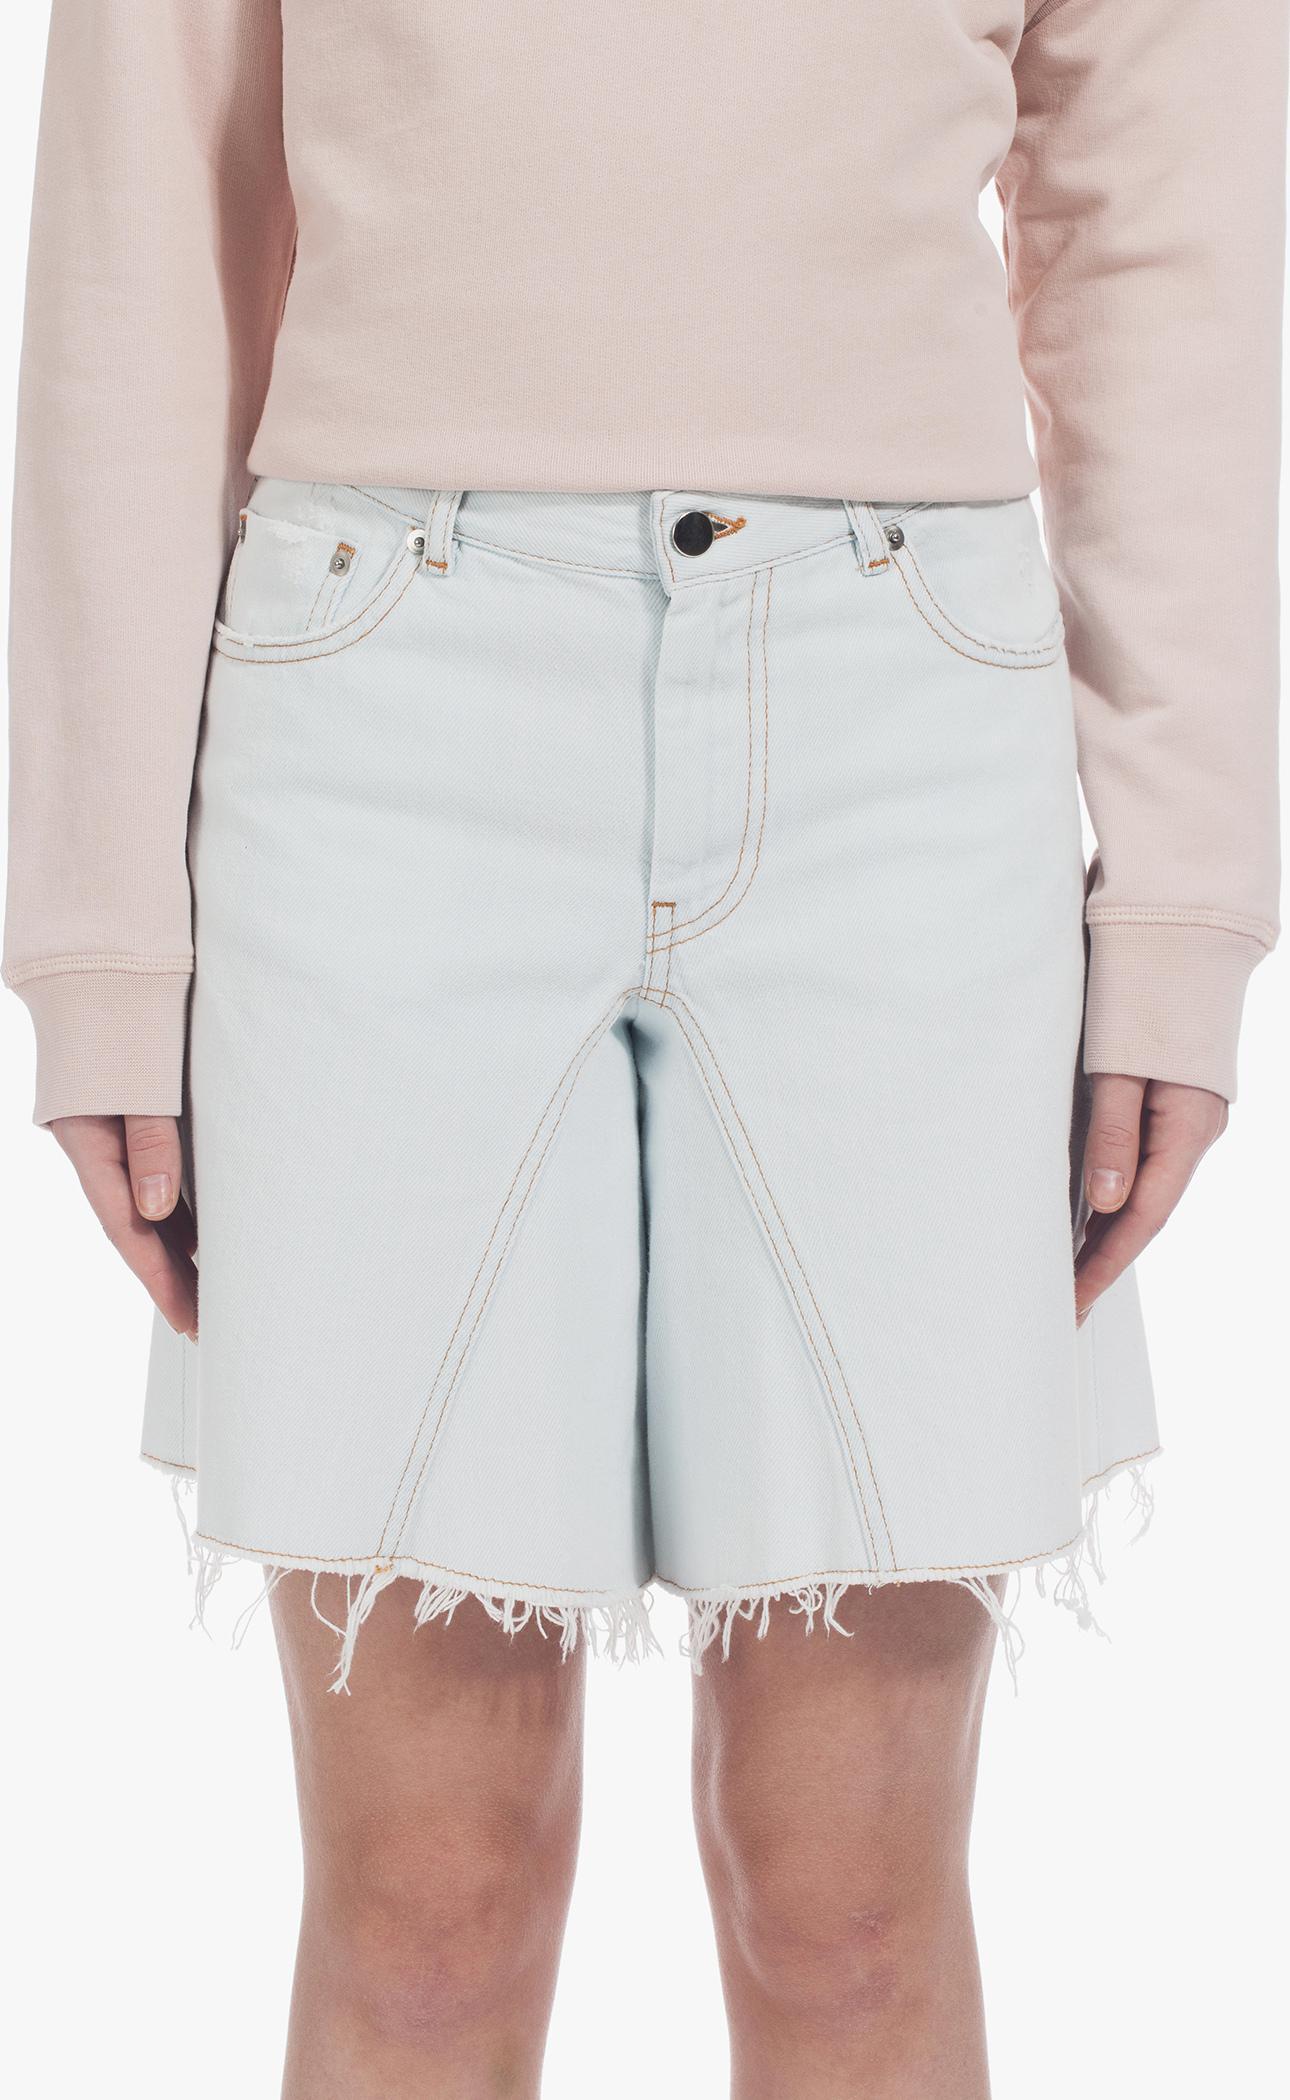 Denim shorts Maison Martin Margiela Sale 100% Original Outlet Authentic Sale 100% Authentic Sale With Paypal Countdown Package For Sale 0yzy4Z